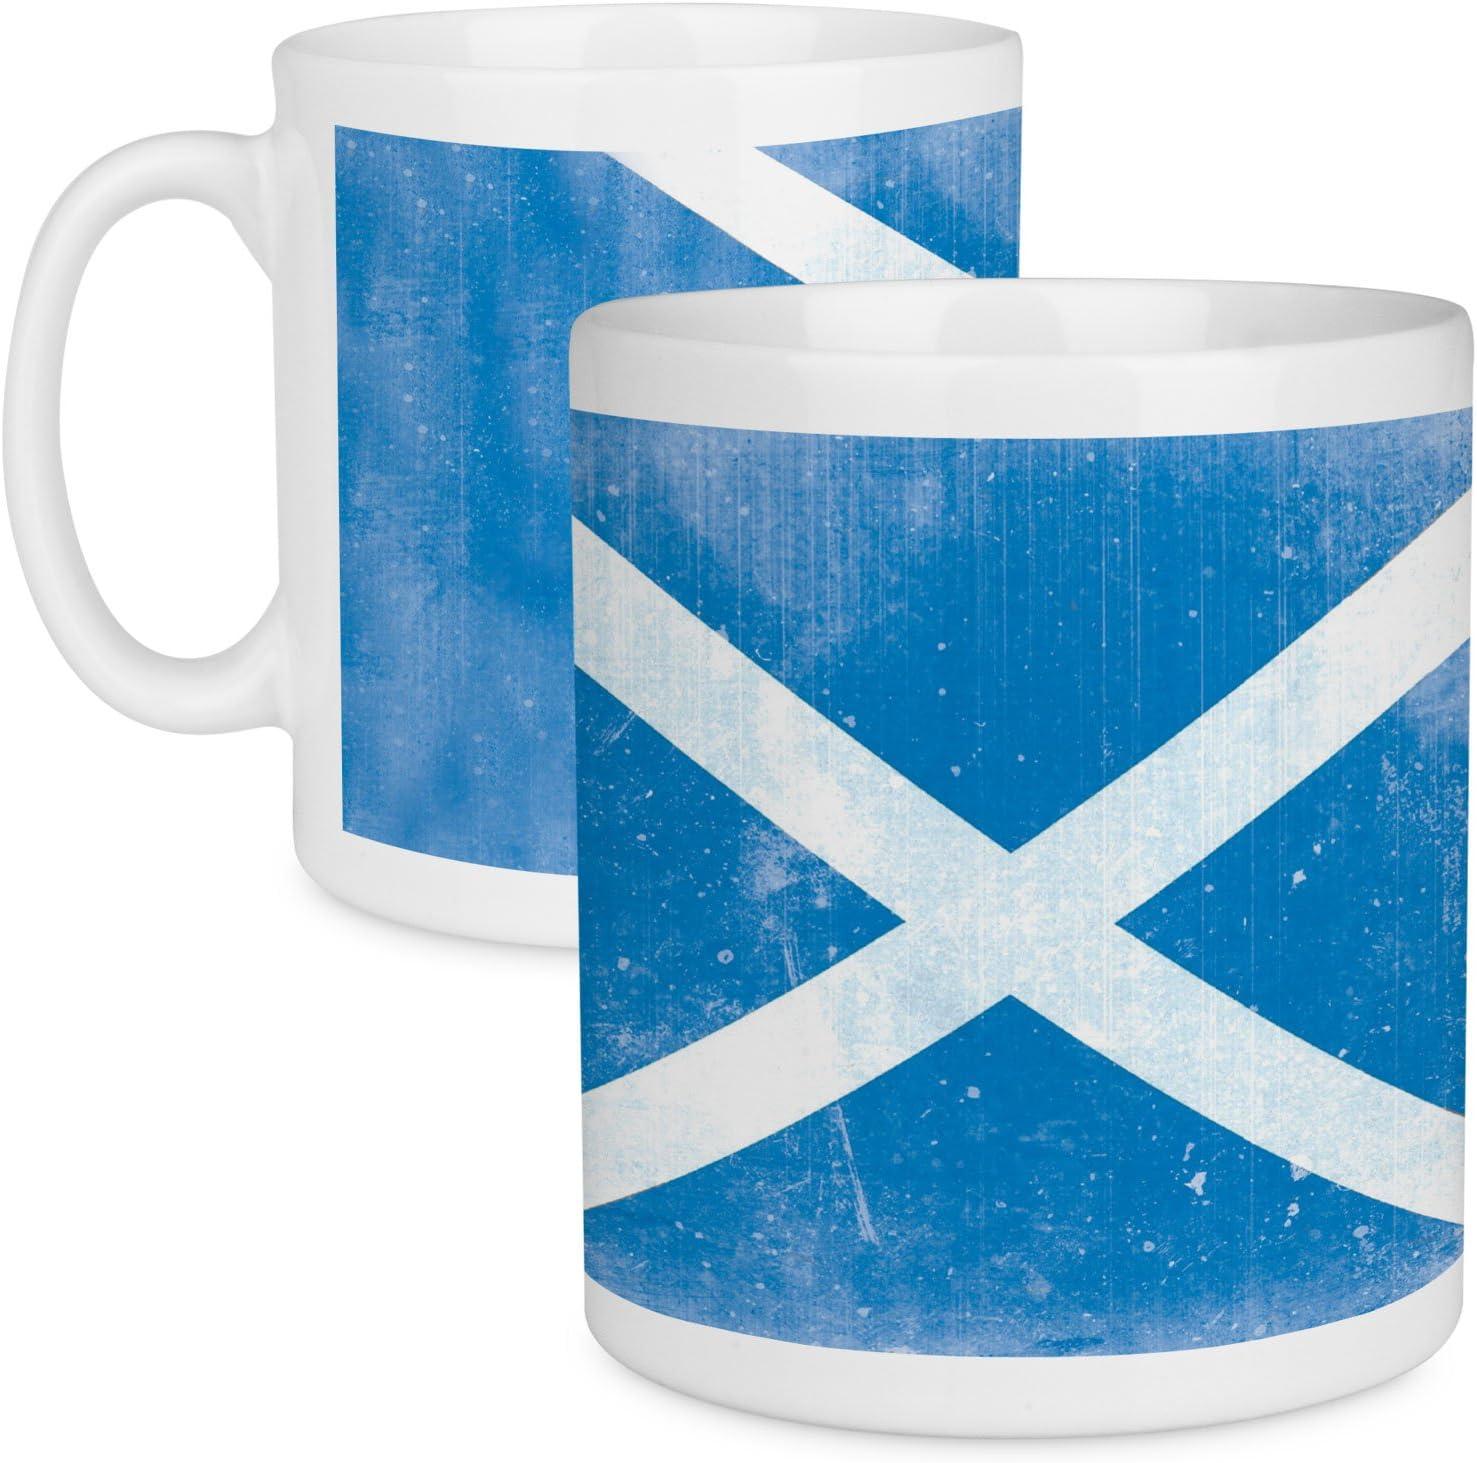 Scottish Flag MugSaltire St Andrews Cross Flag Ceramic MugScottish Gifts